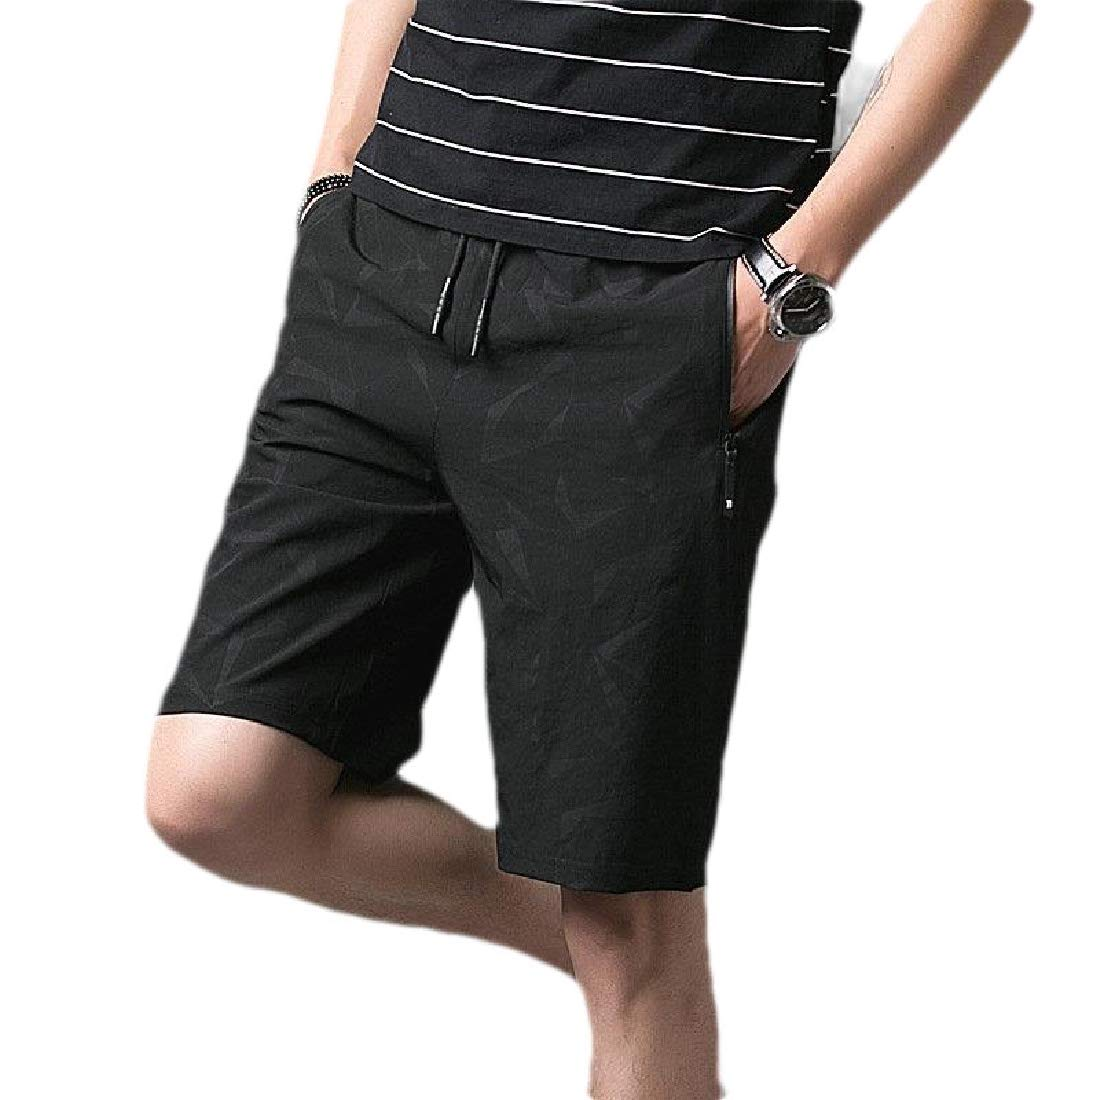 Fubotevic Mens Stretchy Boardshorts Sport Dry Fit Beach Shorts